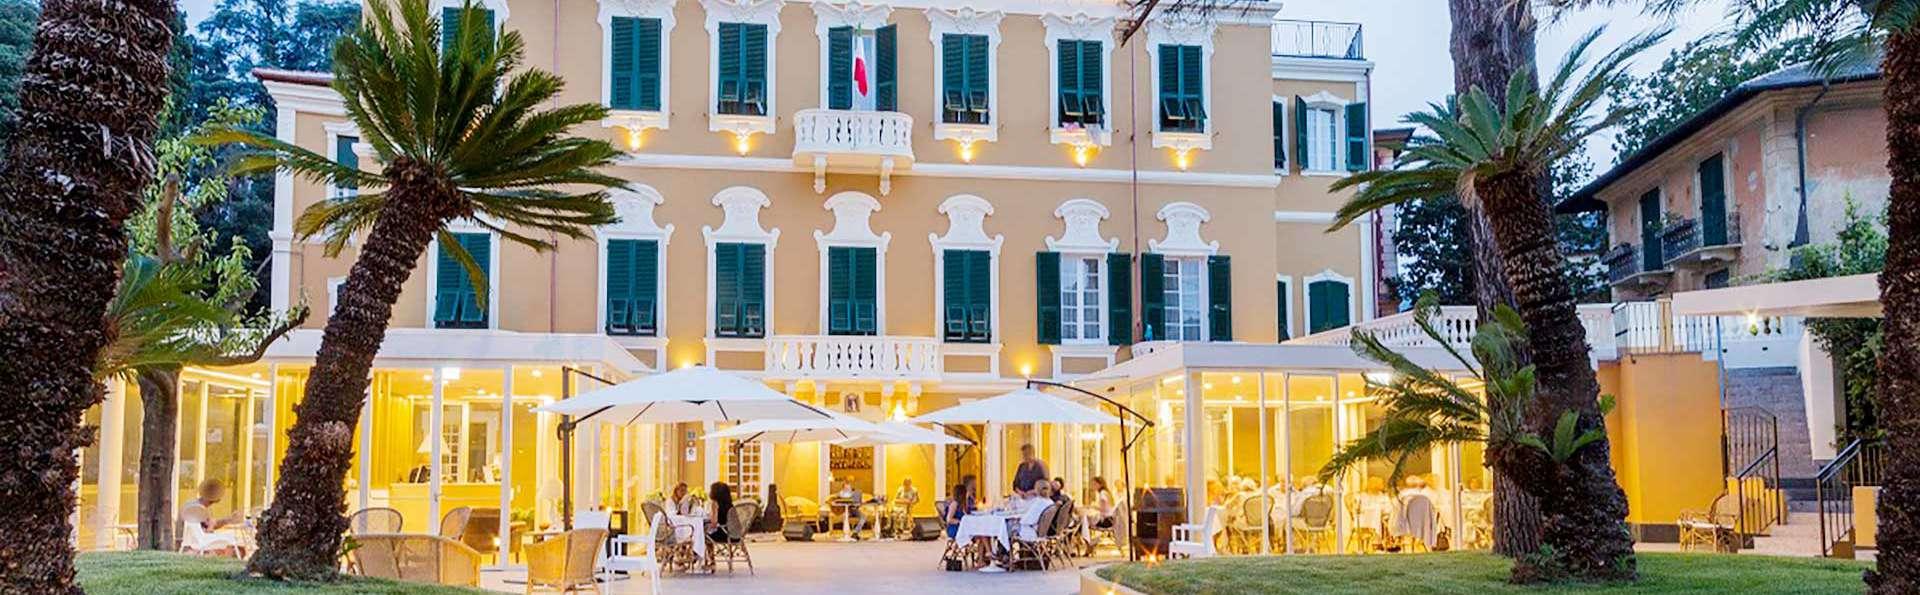 Mediterraneo Emotional Hotel & Spa - EDIT_FRONT_02.jpg